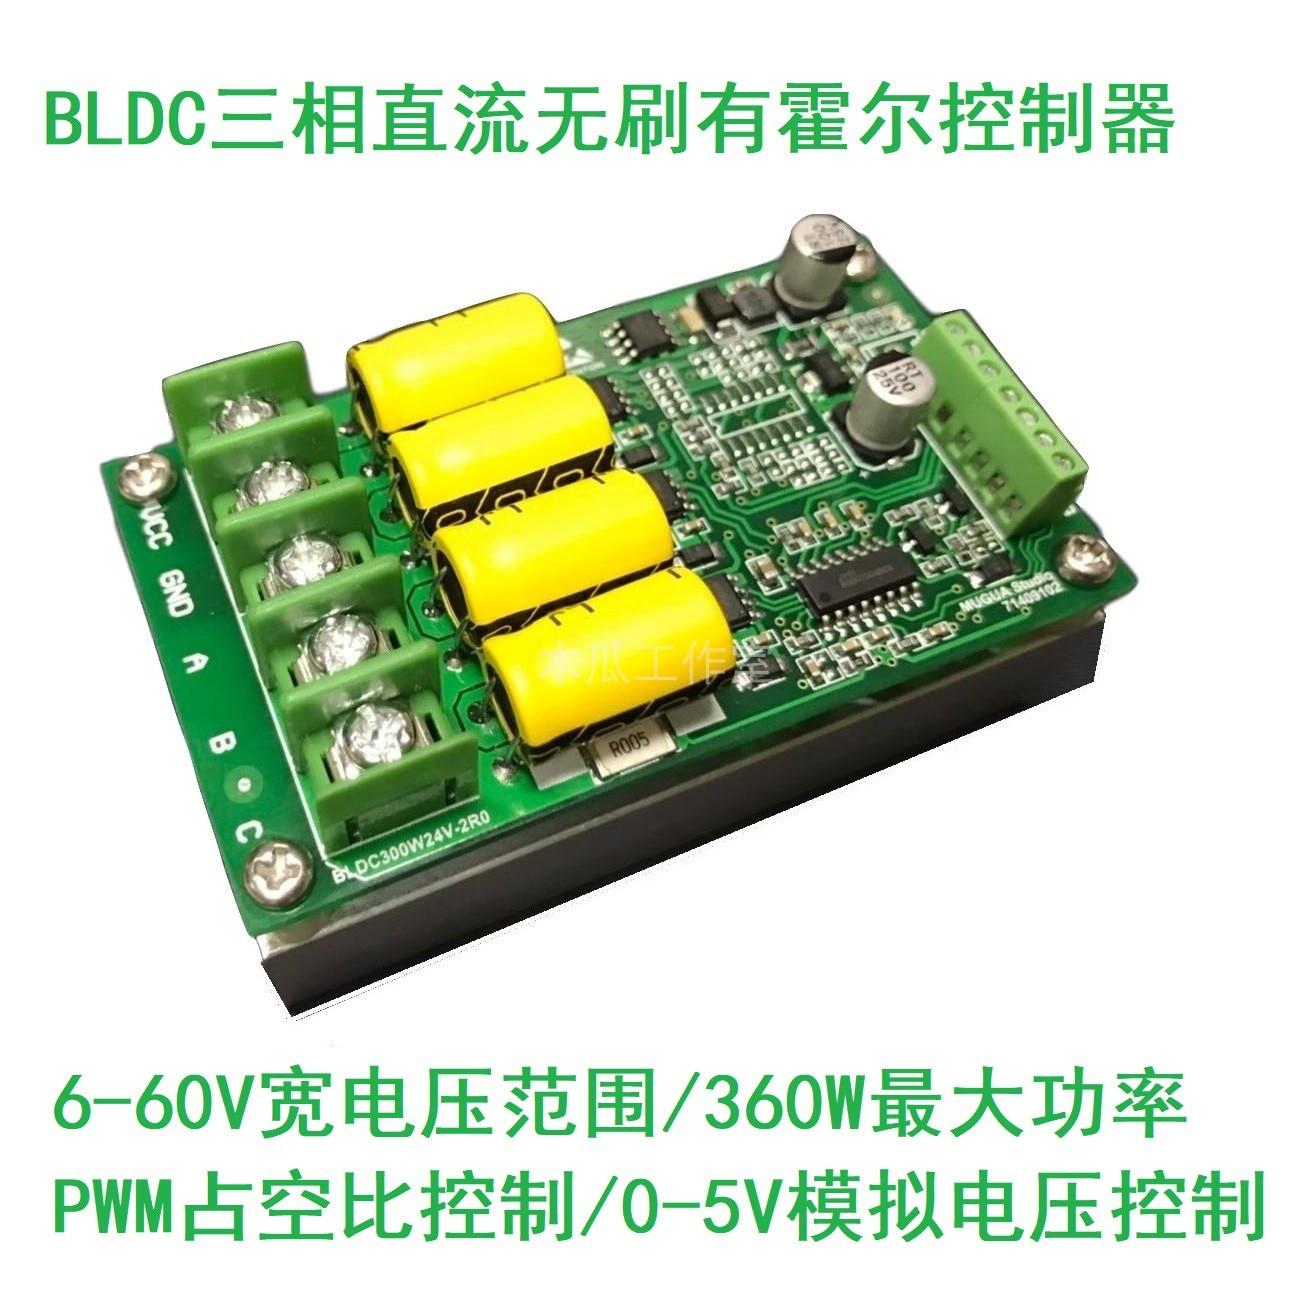 BLDC ثلاث مراحل فرش محرك تيار مستمر تحكم مع جهاز استشعار لمحرك مروحة محرك مروحة 24 فولت